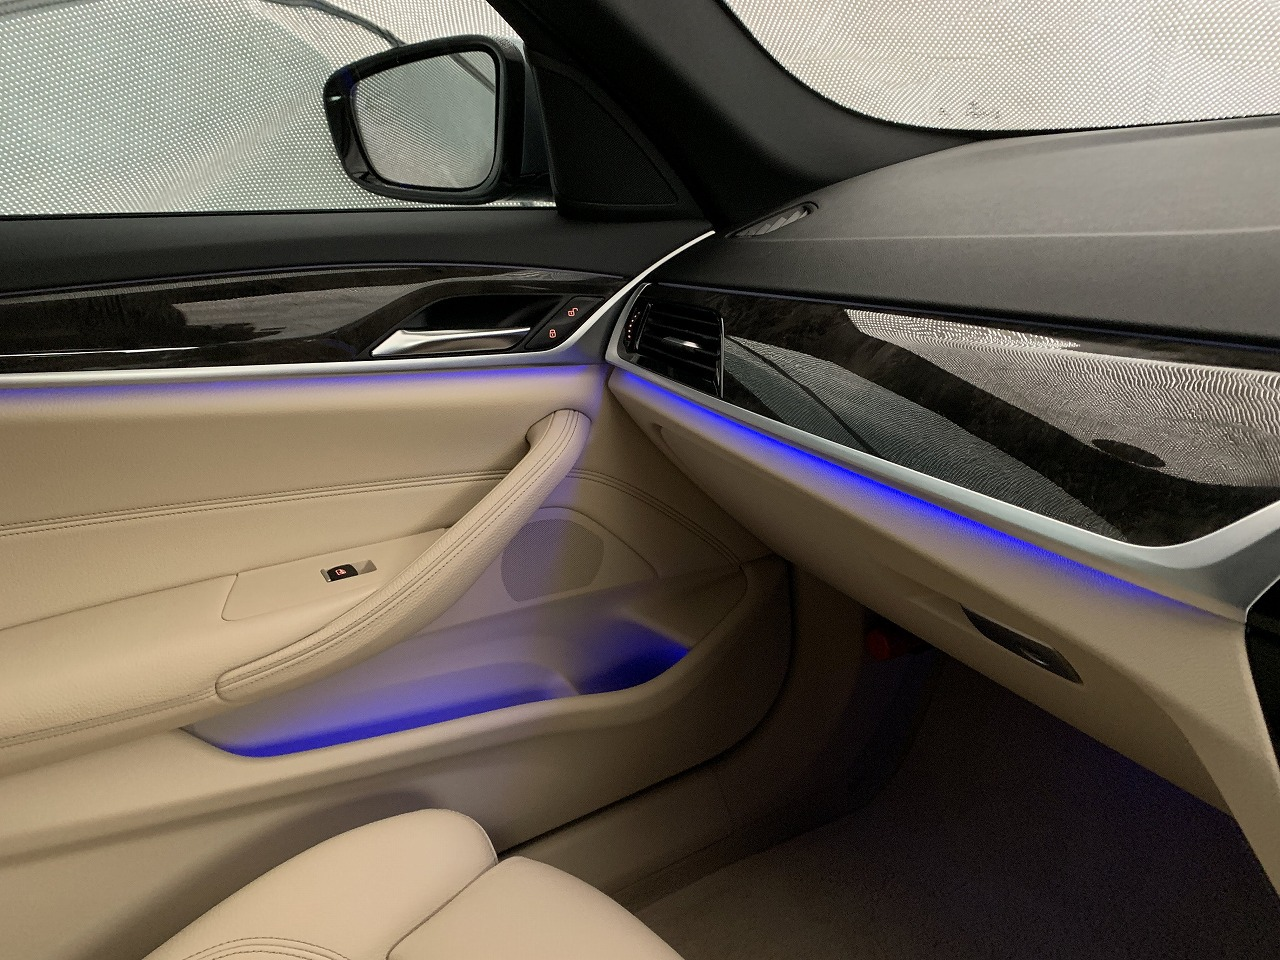 BMW5シリーズツーリング(G31)のアンビエントライトは6色・11パターンあり迷いますw